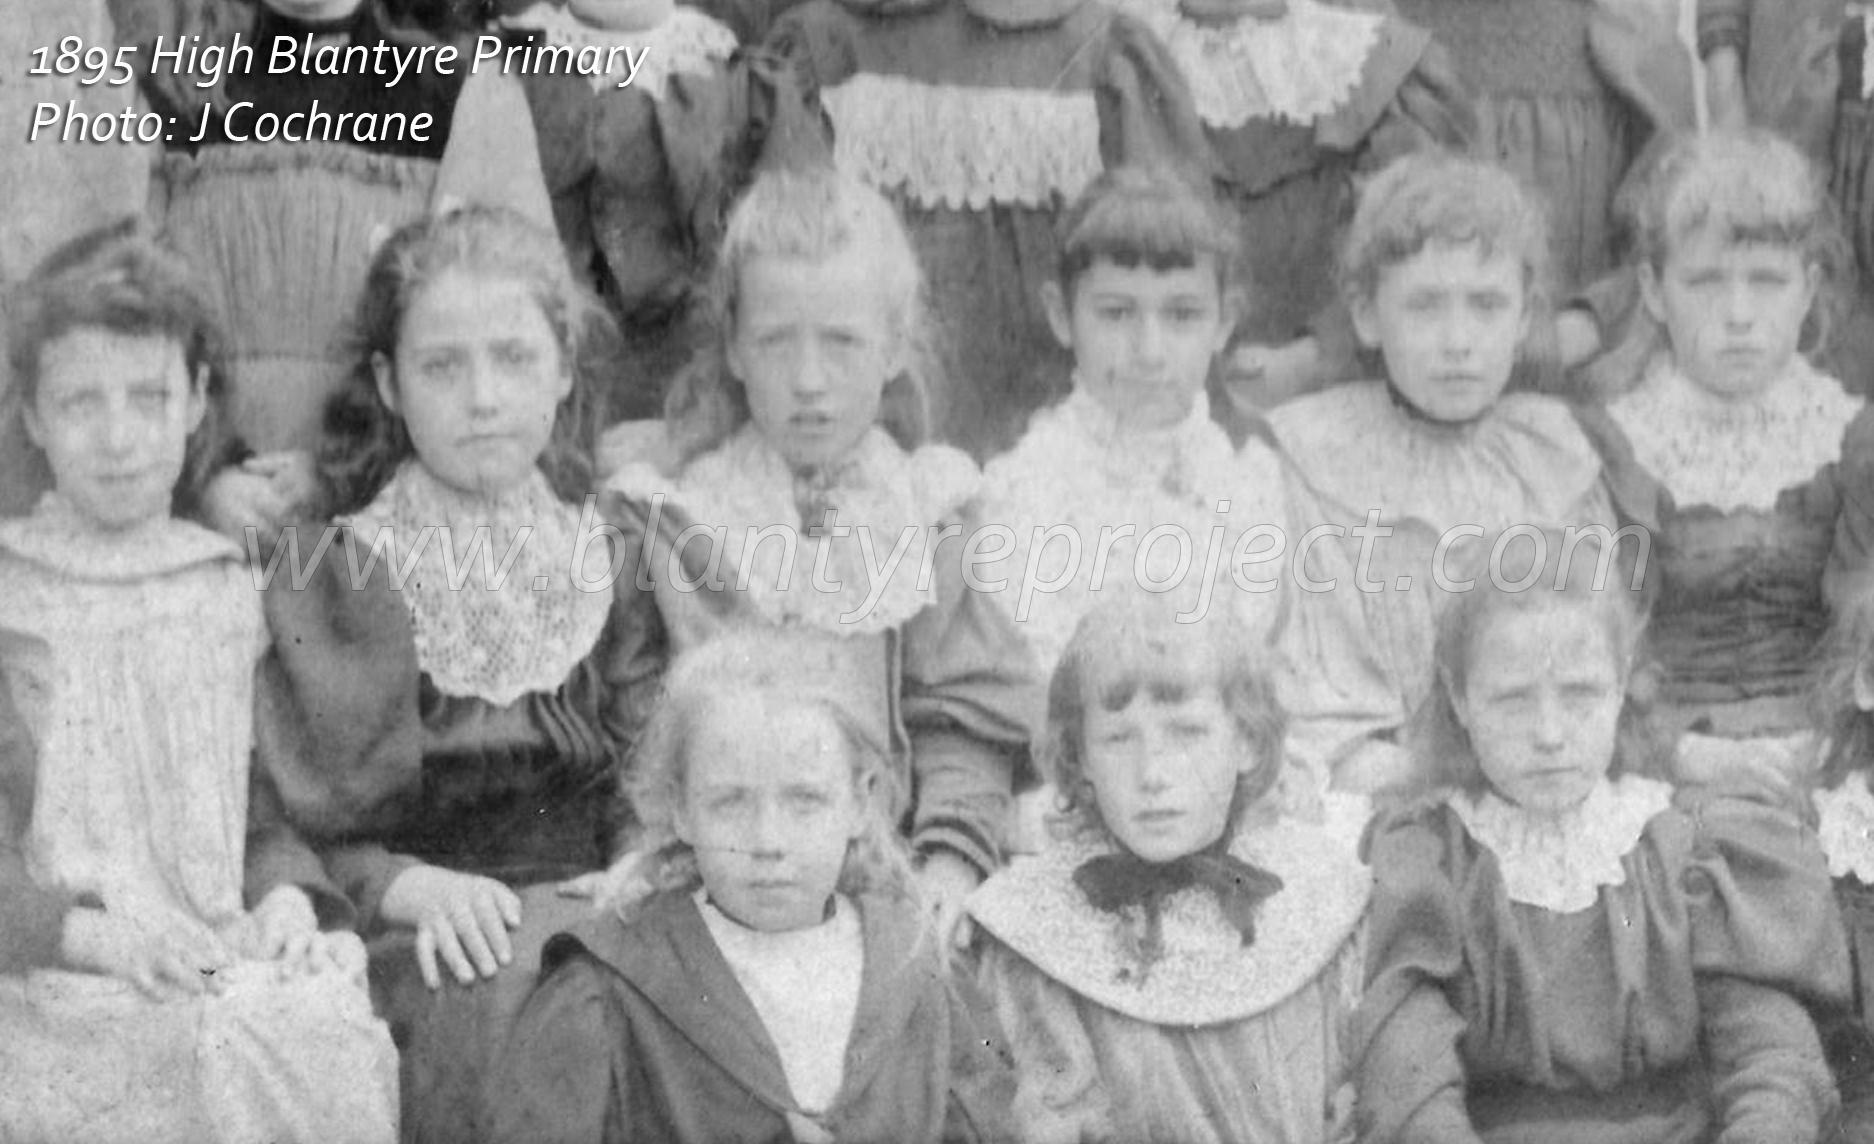 1895 High Blantyre School